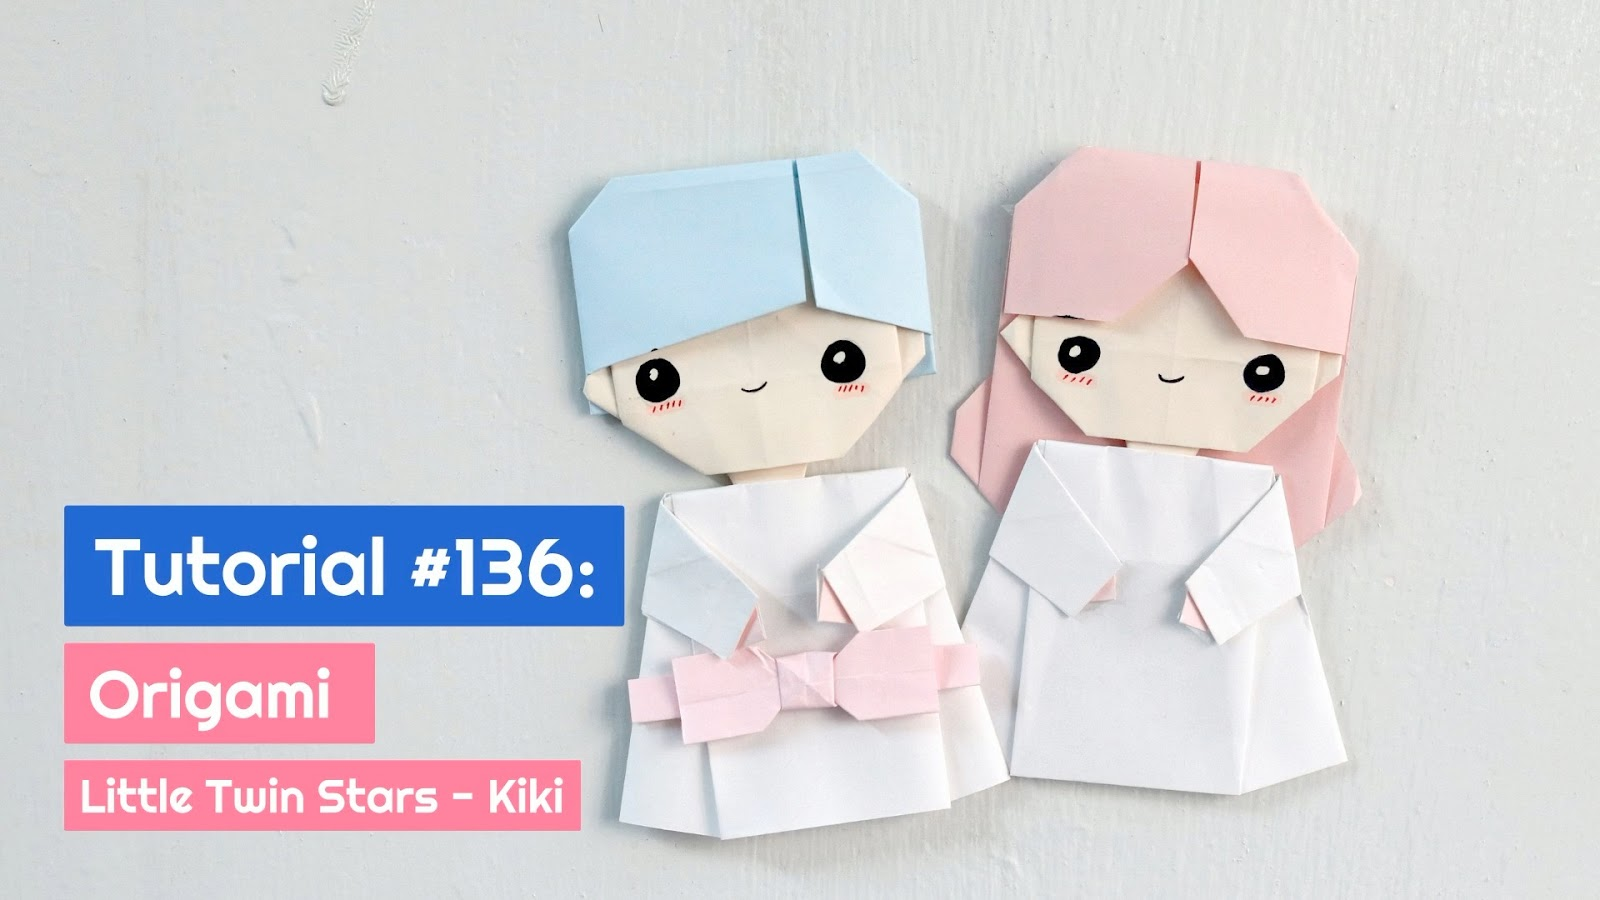 Tutorial 136 Origami Little Twin Stars Kiki The Idea King